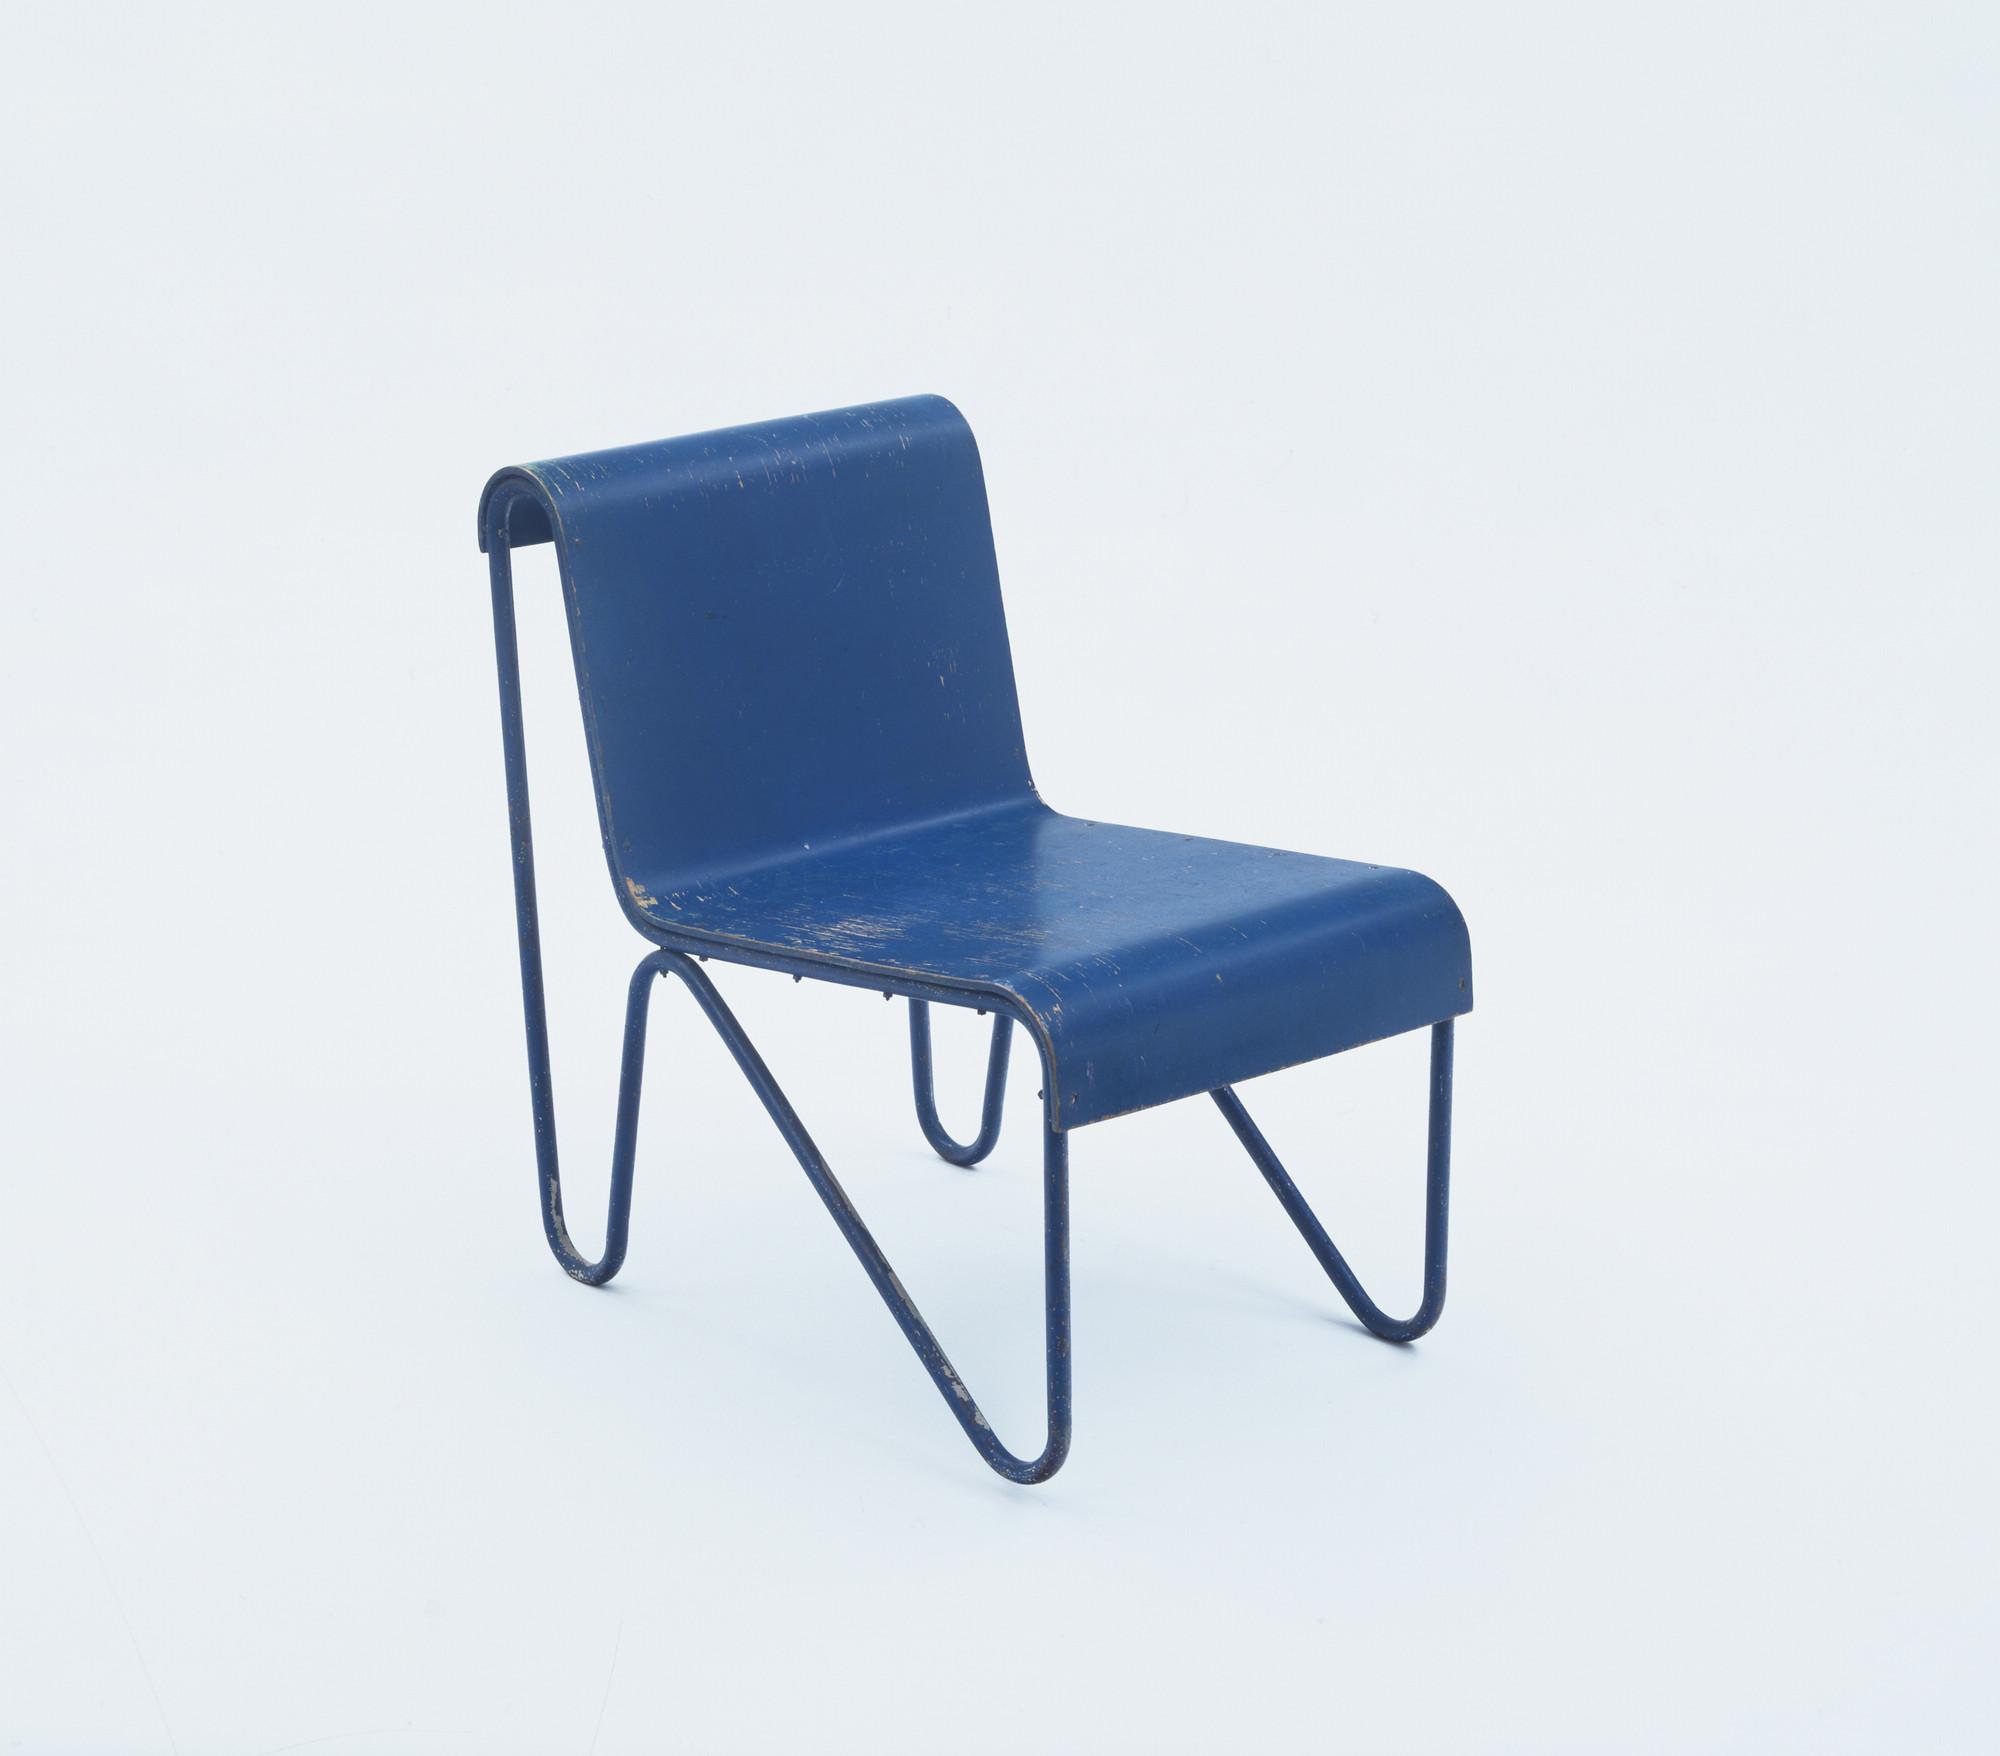 Gerrit Rietveld Moma